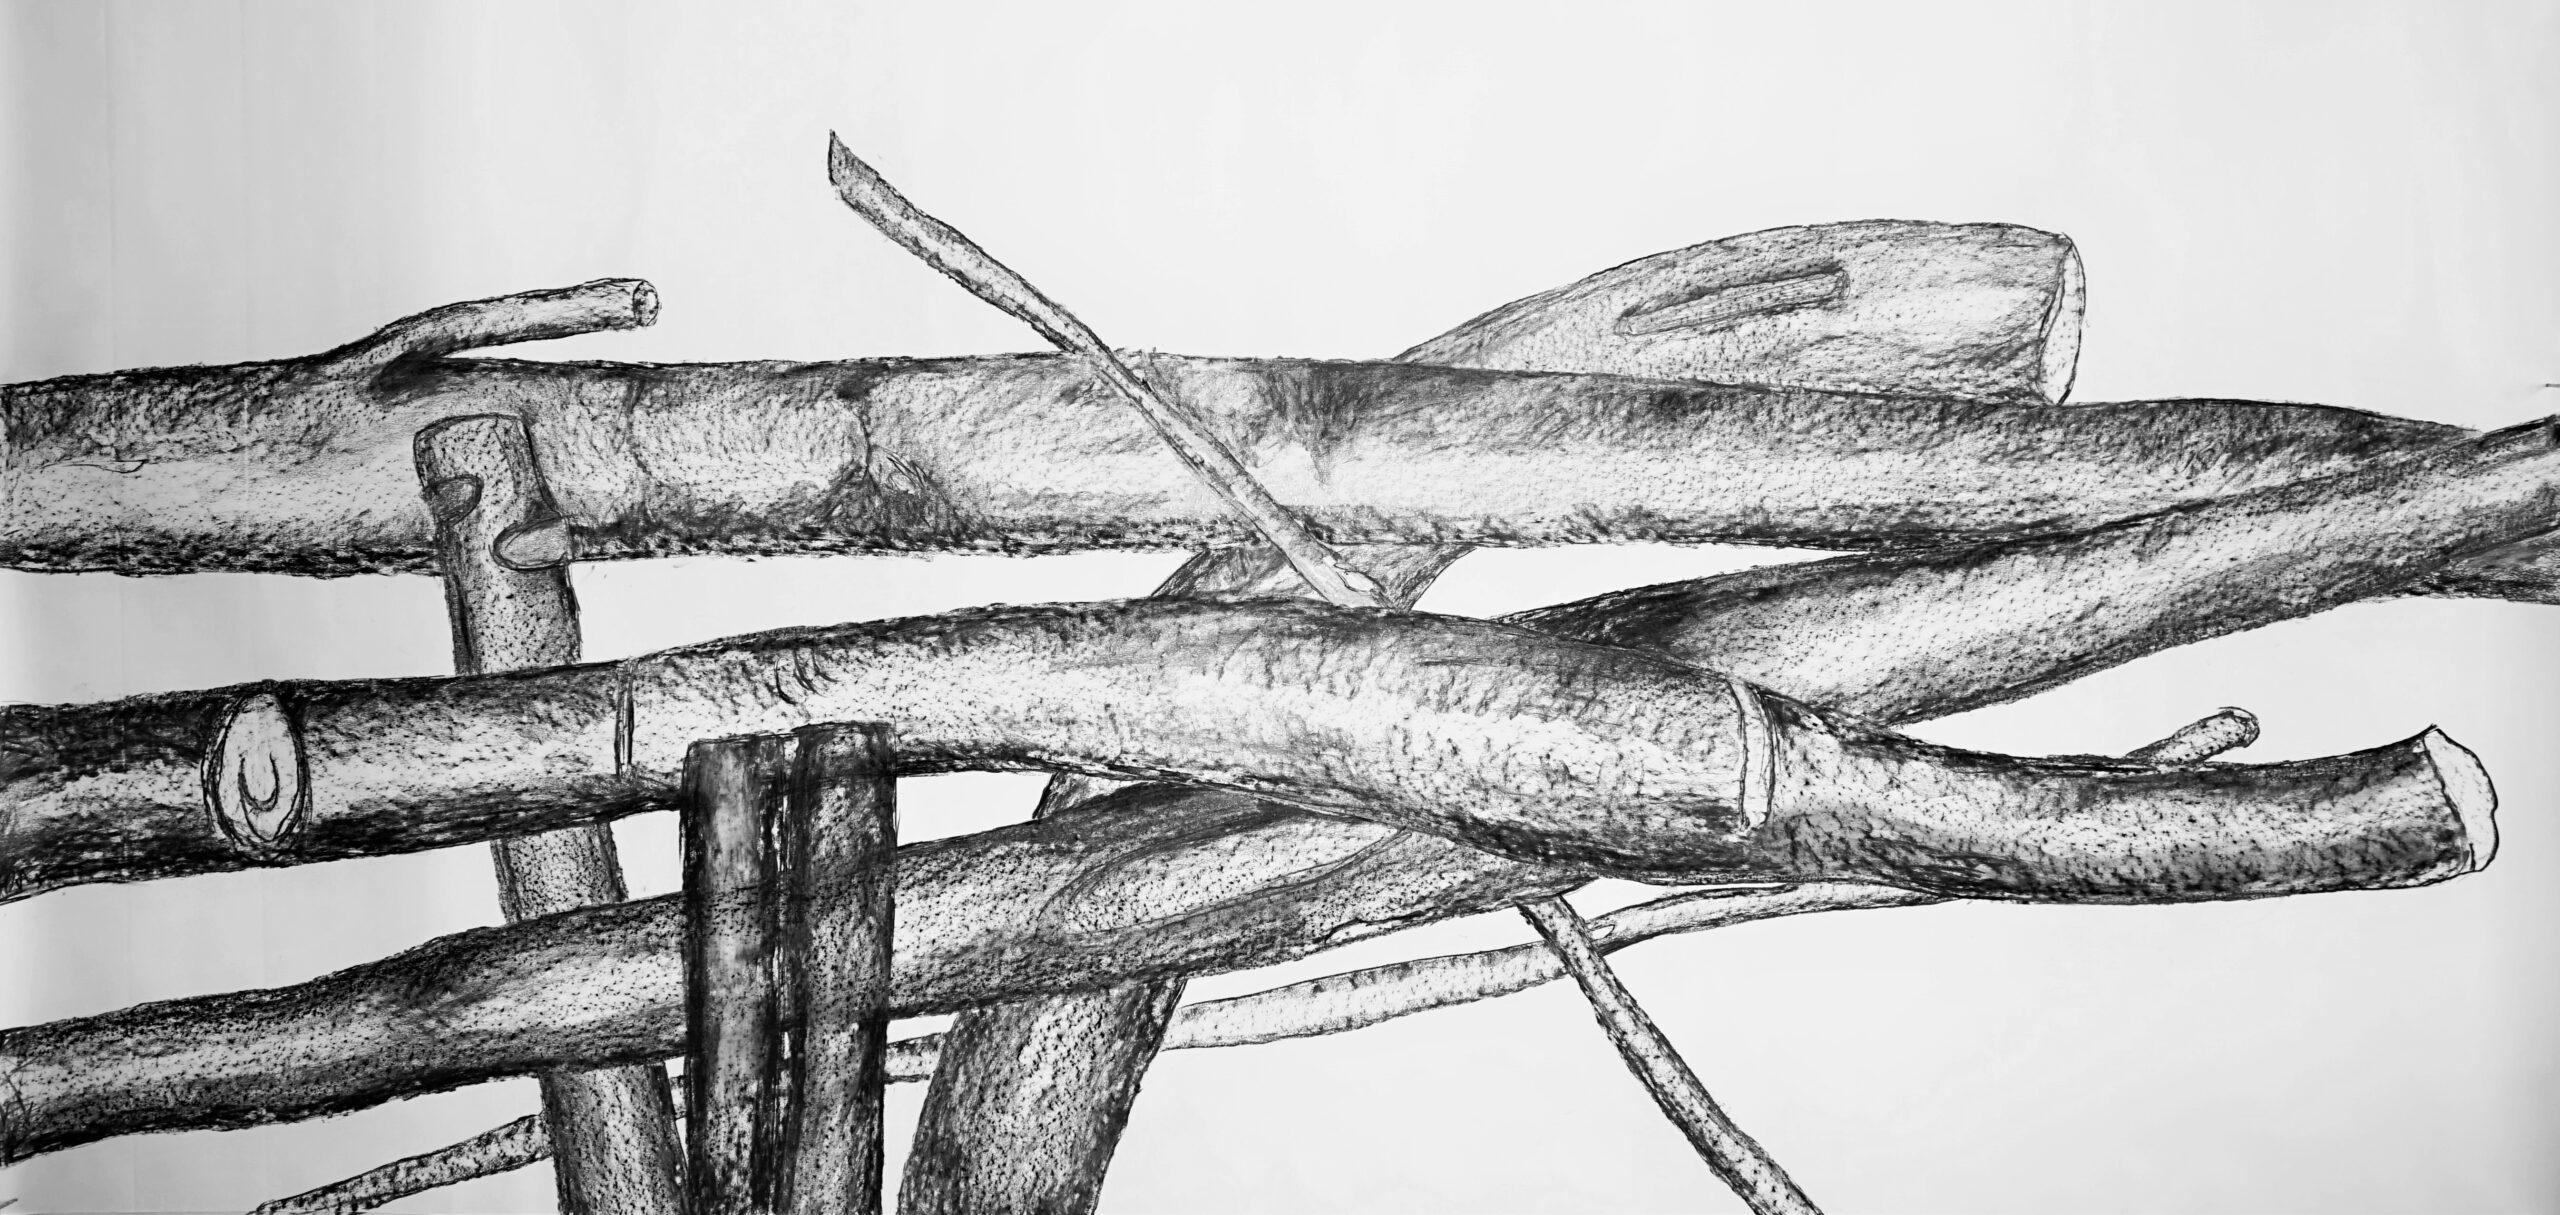 Serie I, 2,70m x 1,50m, Grafitstift, Kohle auf Papier